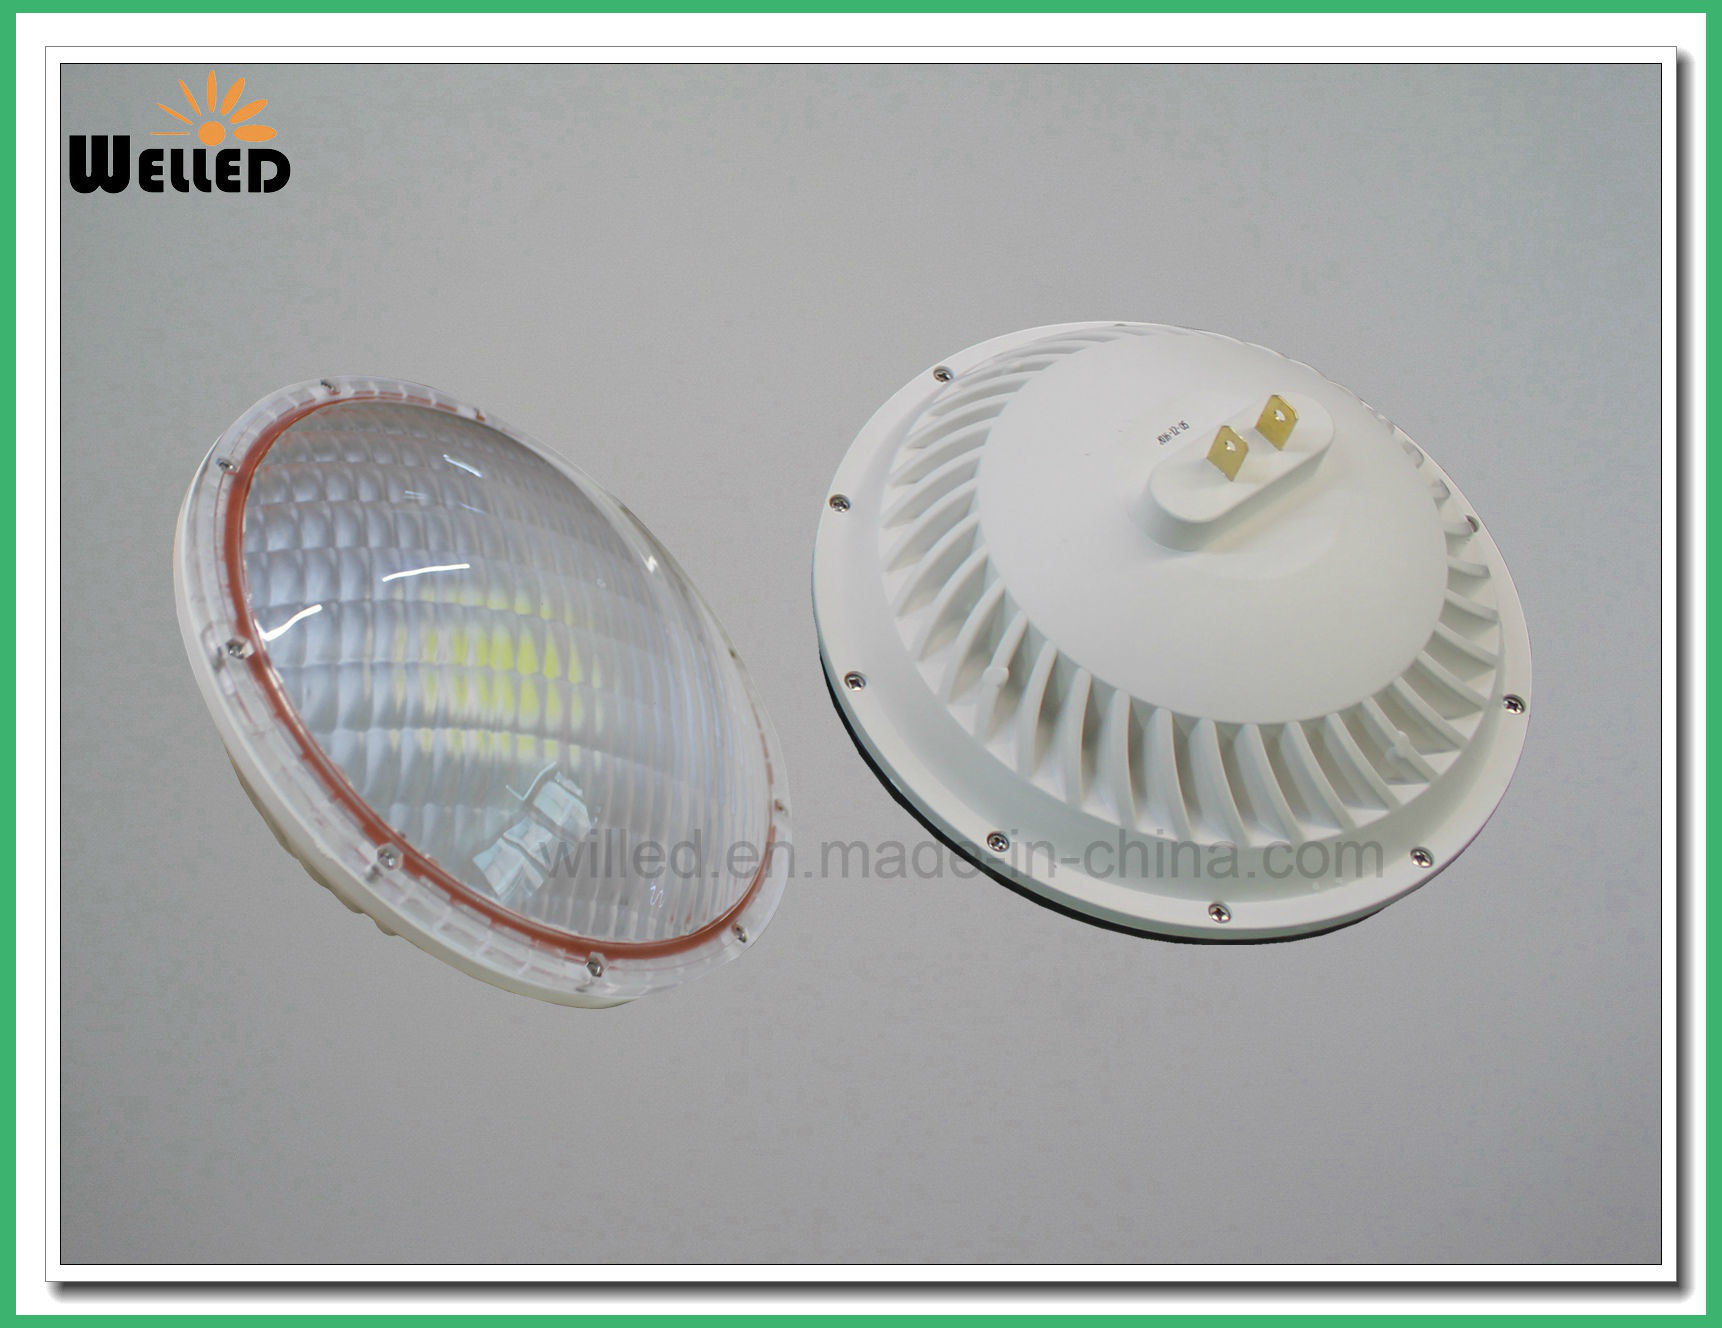 RGB Remote Control LED Swimming Pool Light 36W Surface Mounted LED PAR56 Lamp 12V G53 Gx16D